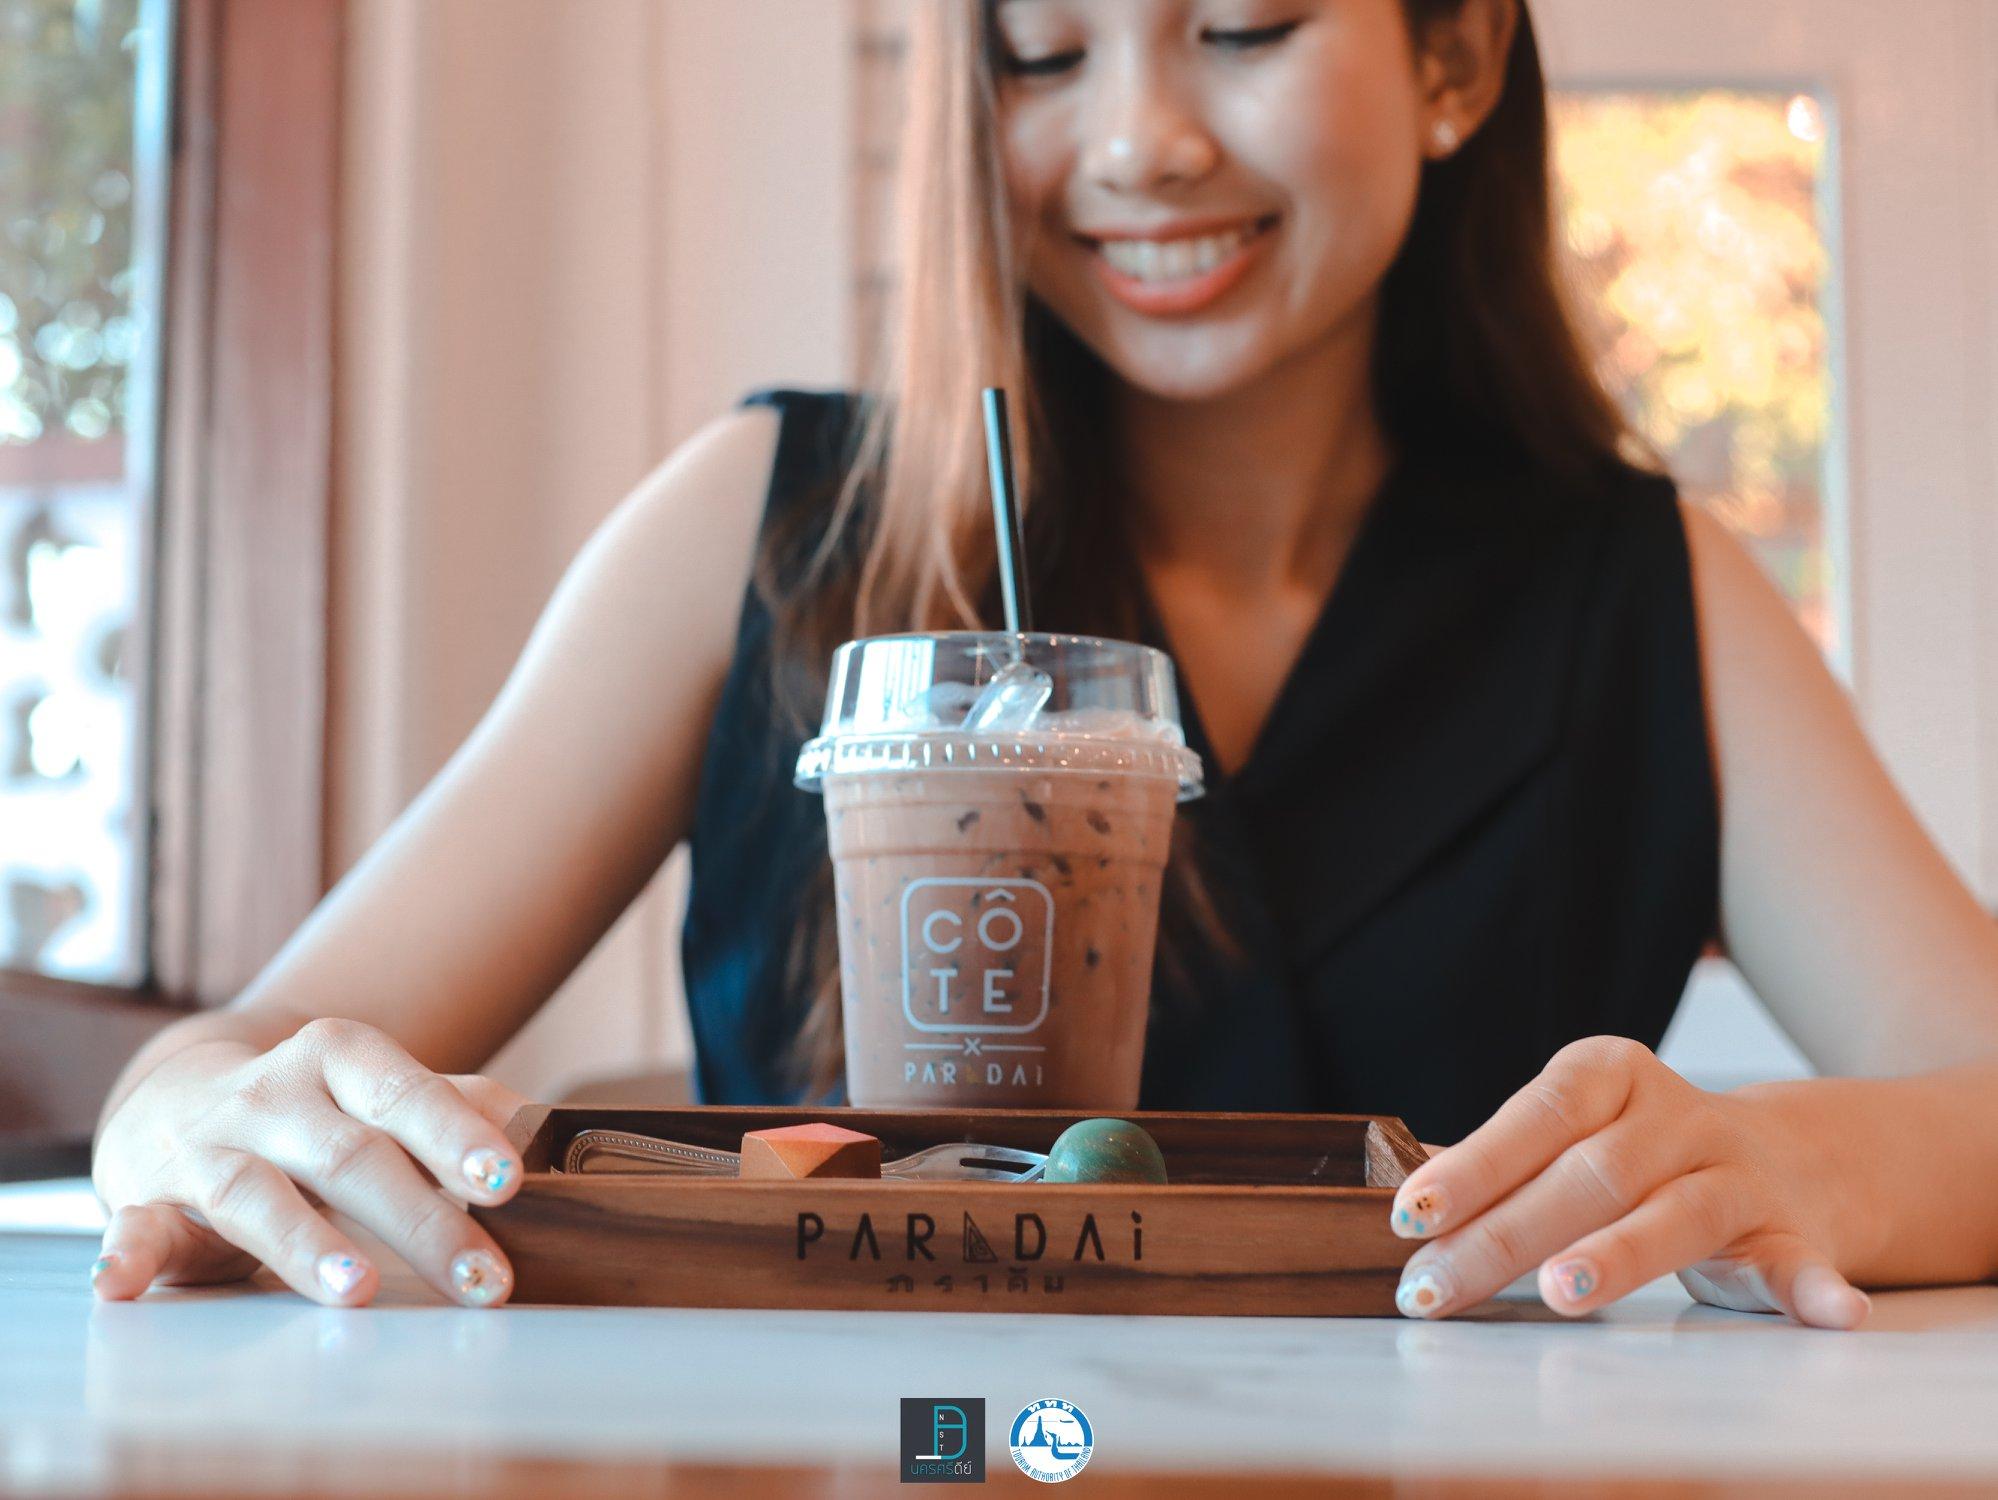 9.-Cote-x-Paradai-ขึ้นชื่ออยู่แล้วว่า-ช็อกโกแลตได้รางวัลระดับโลกกก โกโก้,นครศรีธรรมราช,อร่อย,ergo,coffee,ของกิน,เครื่องดื่ม,คาเฟ่